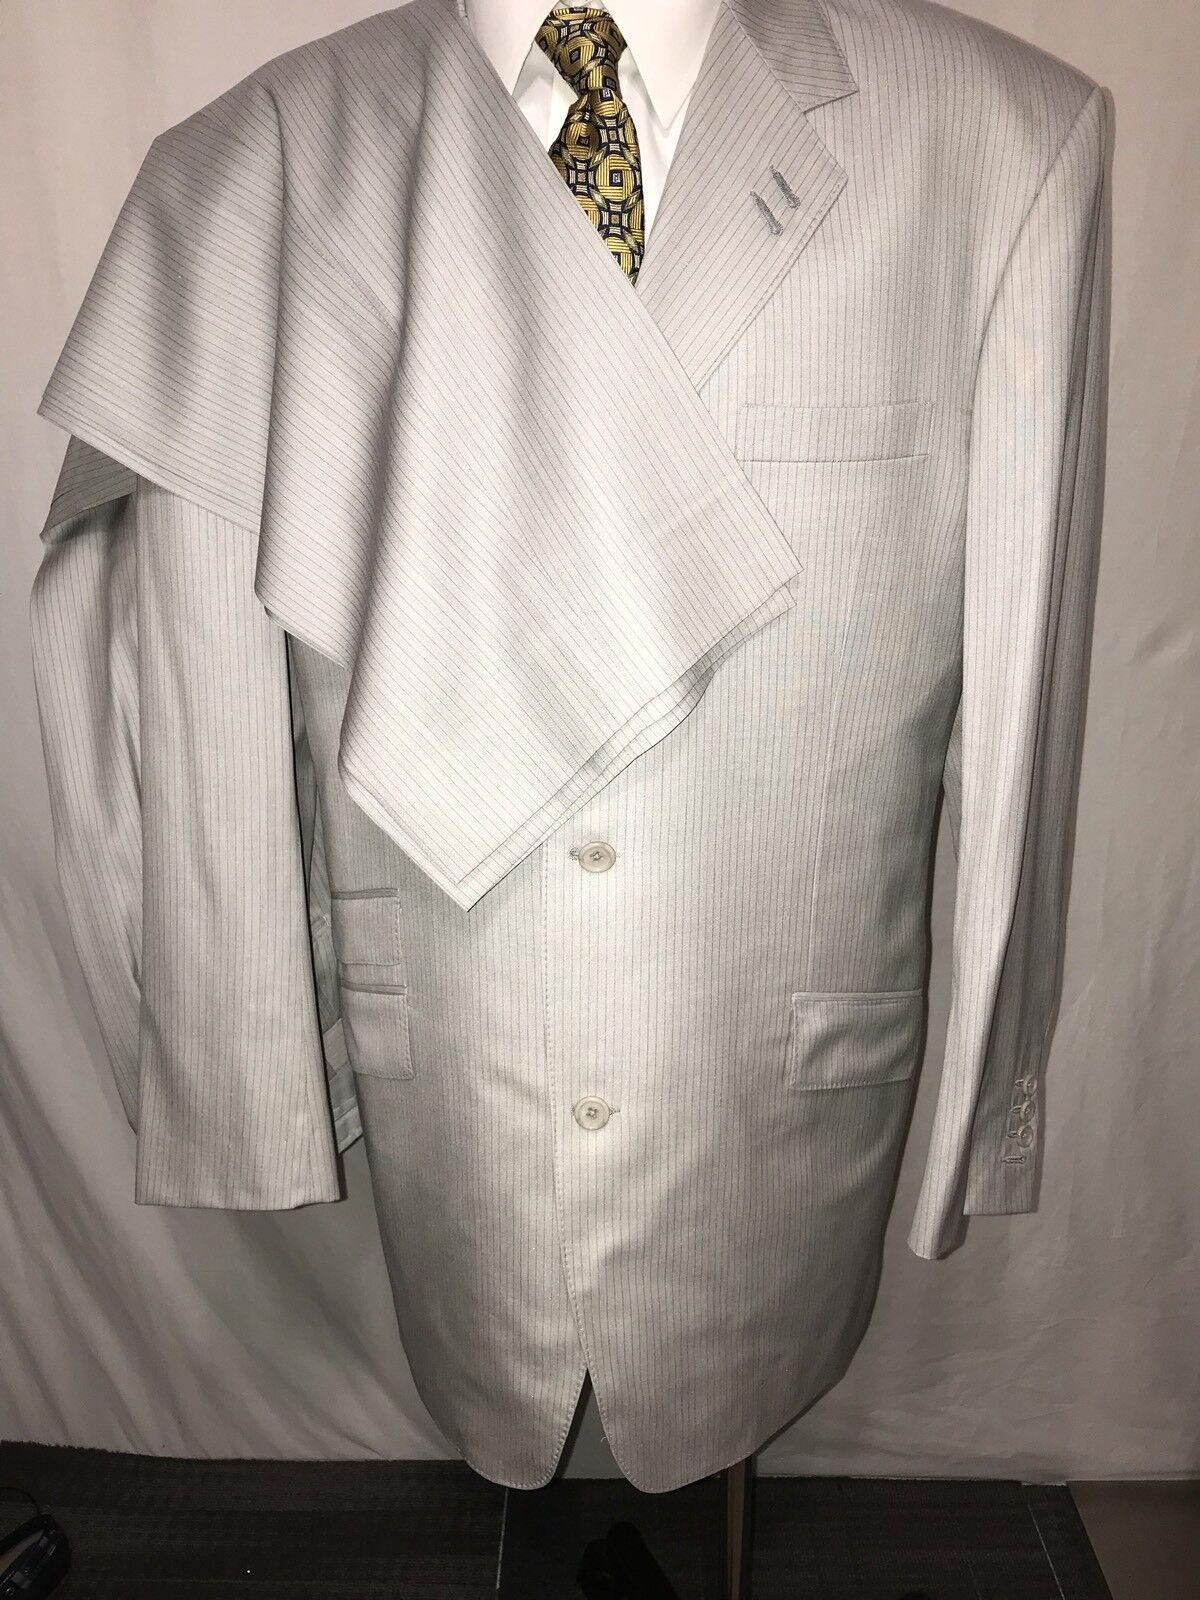 Custom Elevee Light grau striped 2 piece suit men Größe 46XL 37x33 Flat Front